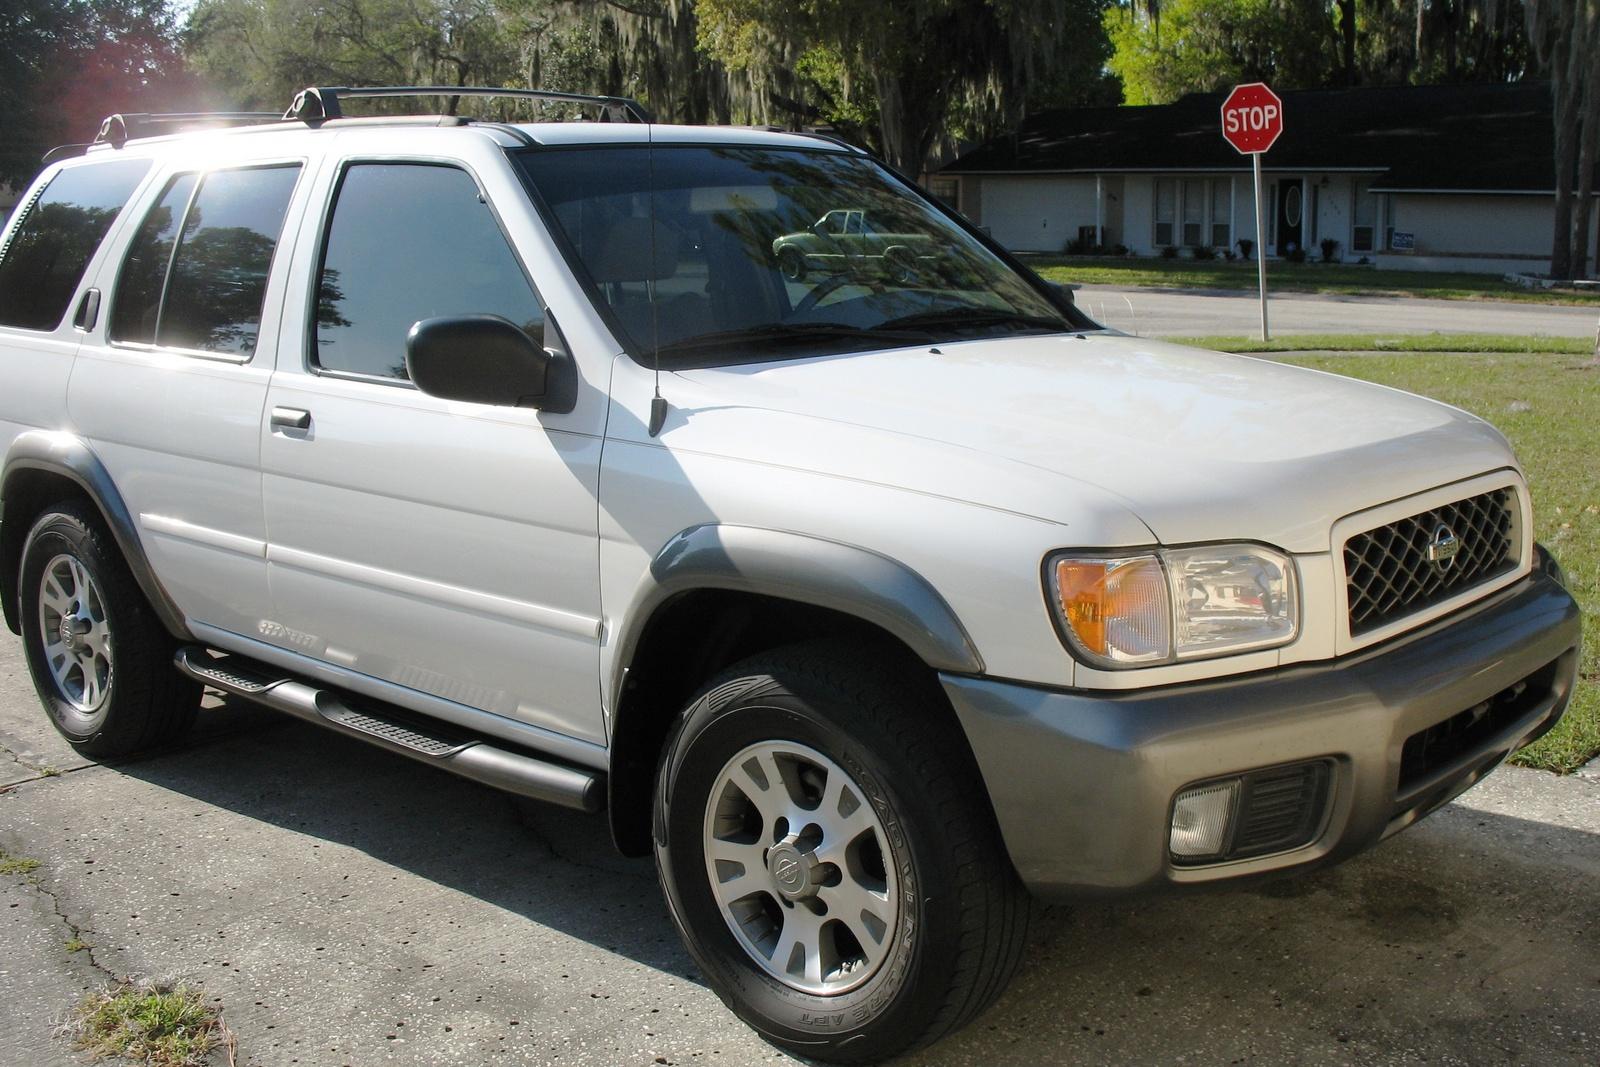 Used 2001 2004 Nissan Pathfinder In Usa.html | Autos Weblog